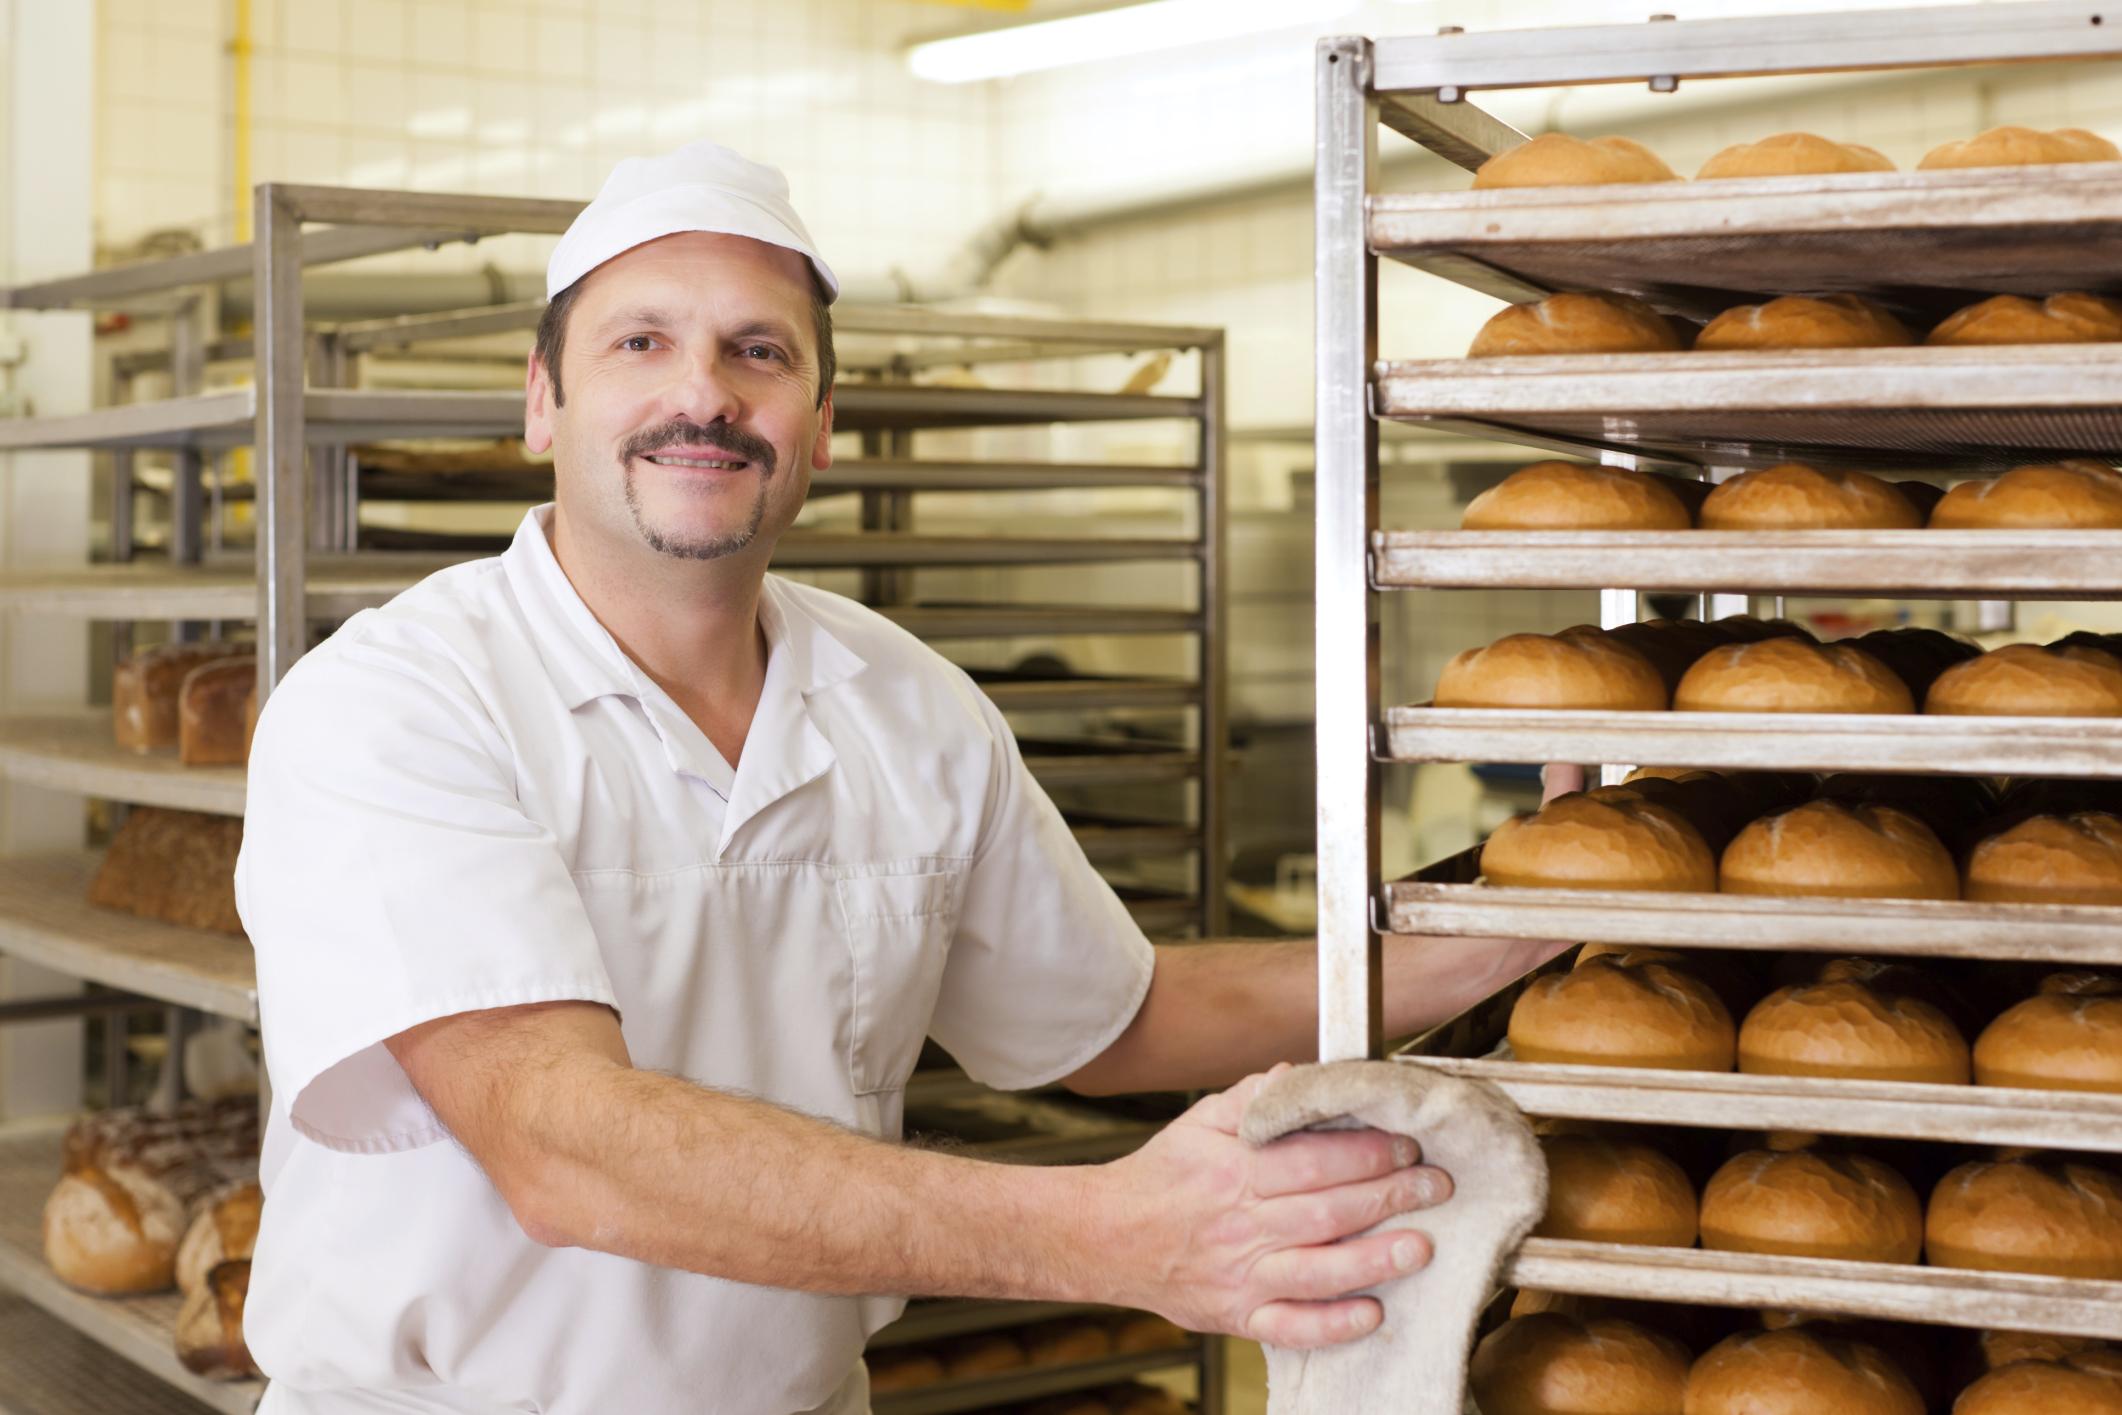 Baker Cake Decorator Job Description : Head Baker Job Description Career Trend